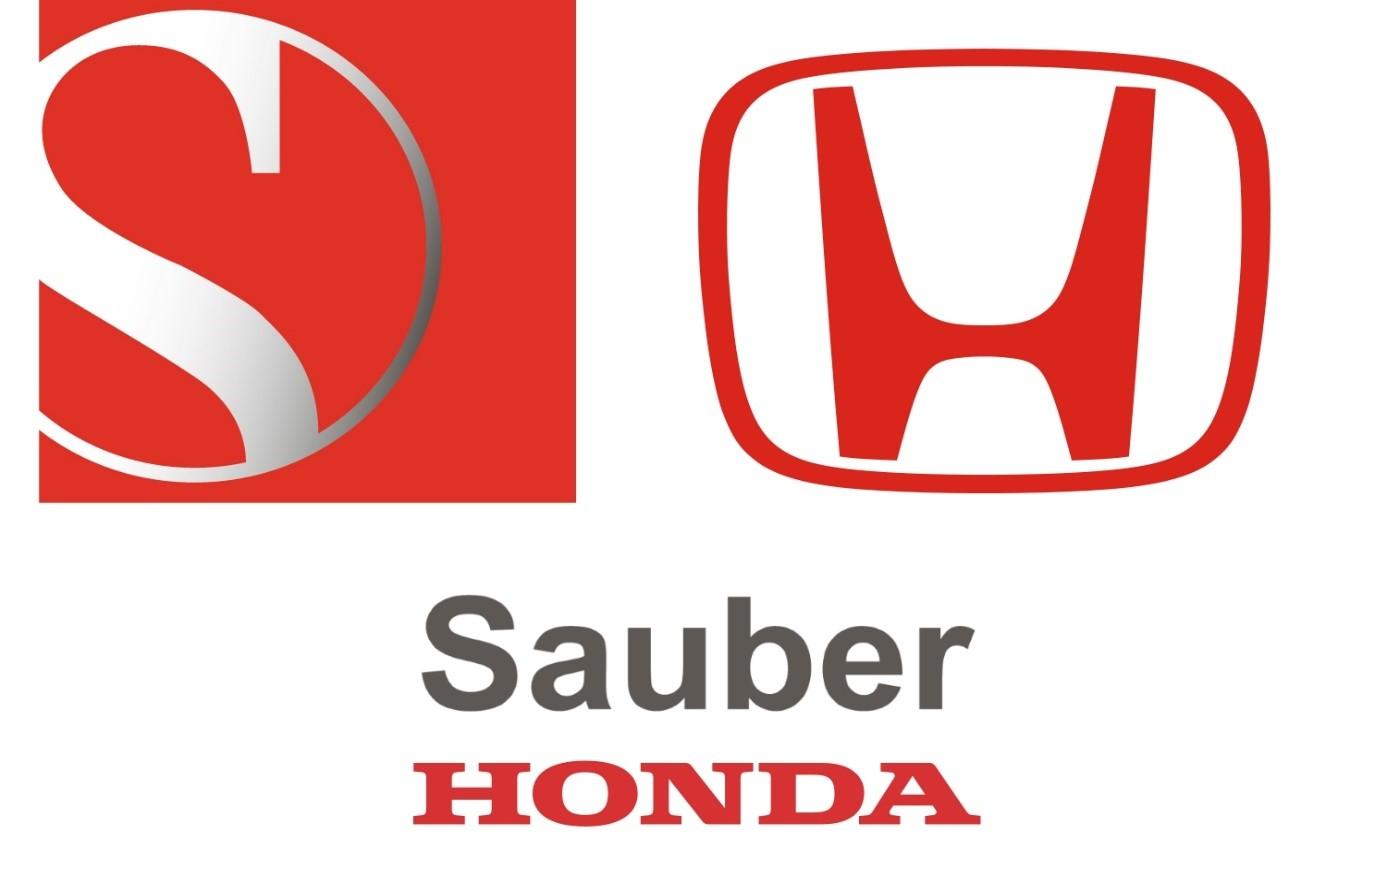 Honda motorral folytatja a Sauber